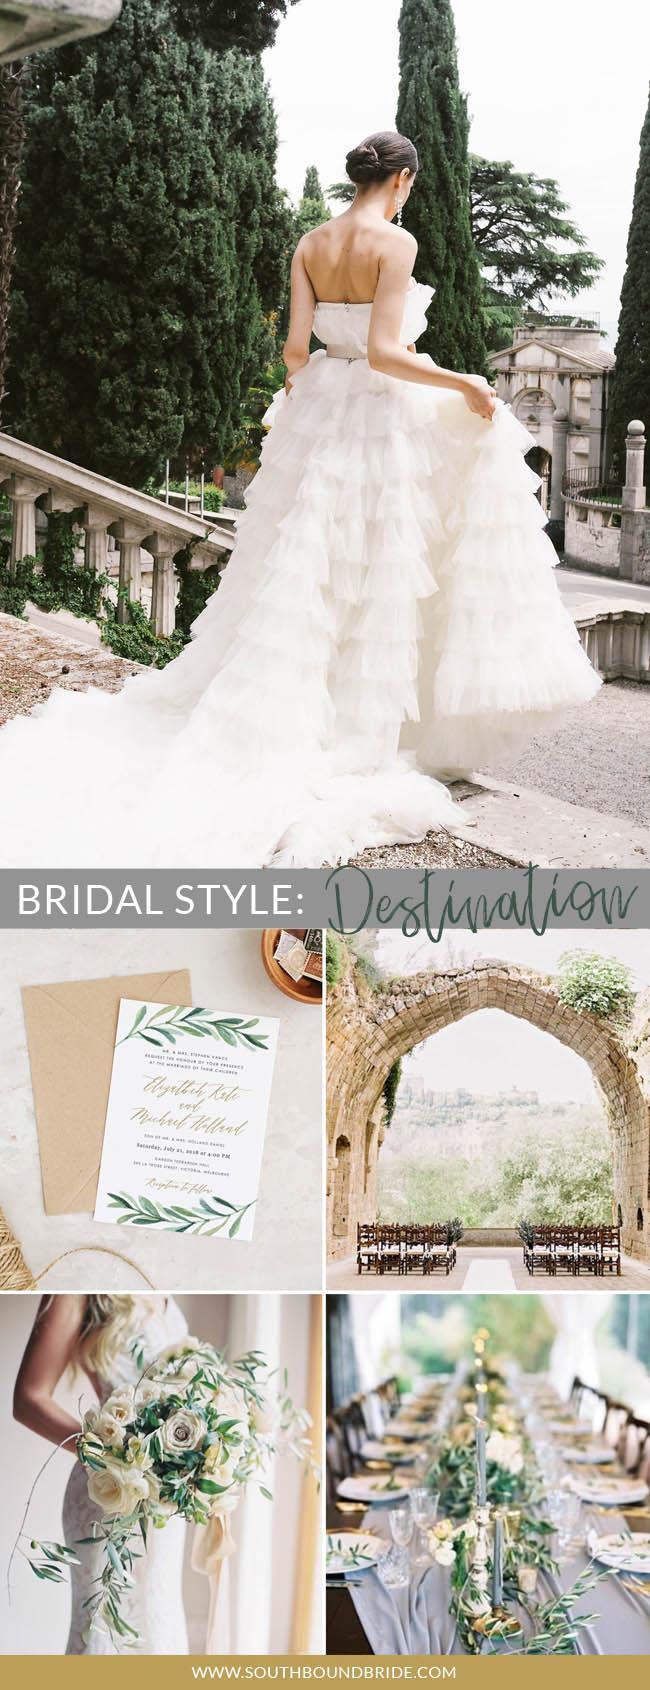 What's Your Bridal Style? Destination